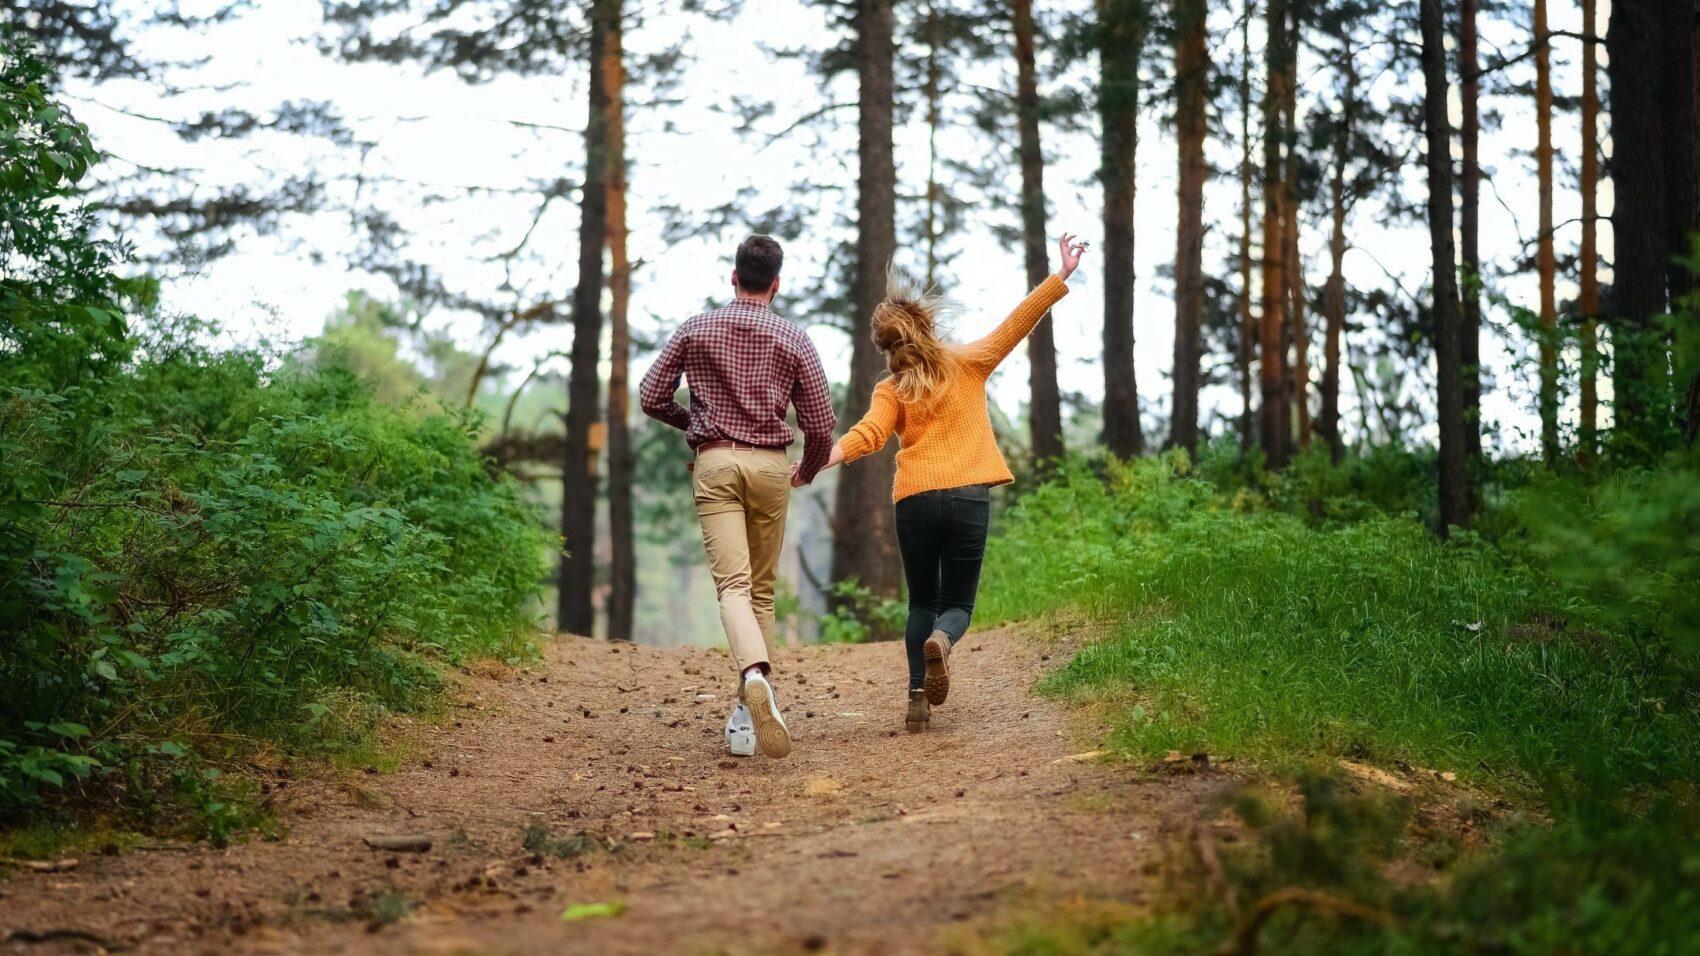 Balade guidée en forêt de Soignes – Groenendael